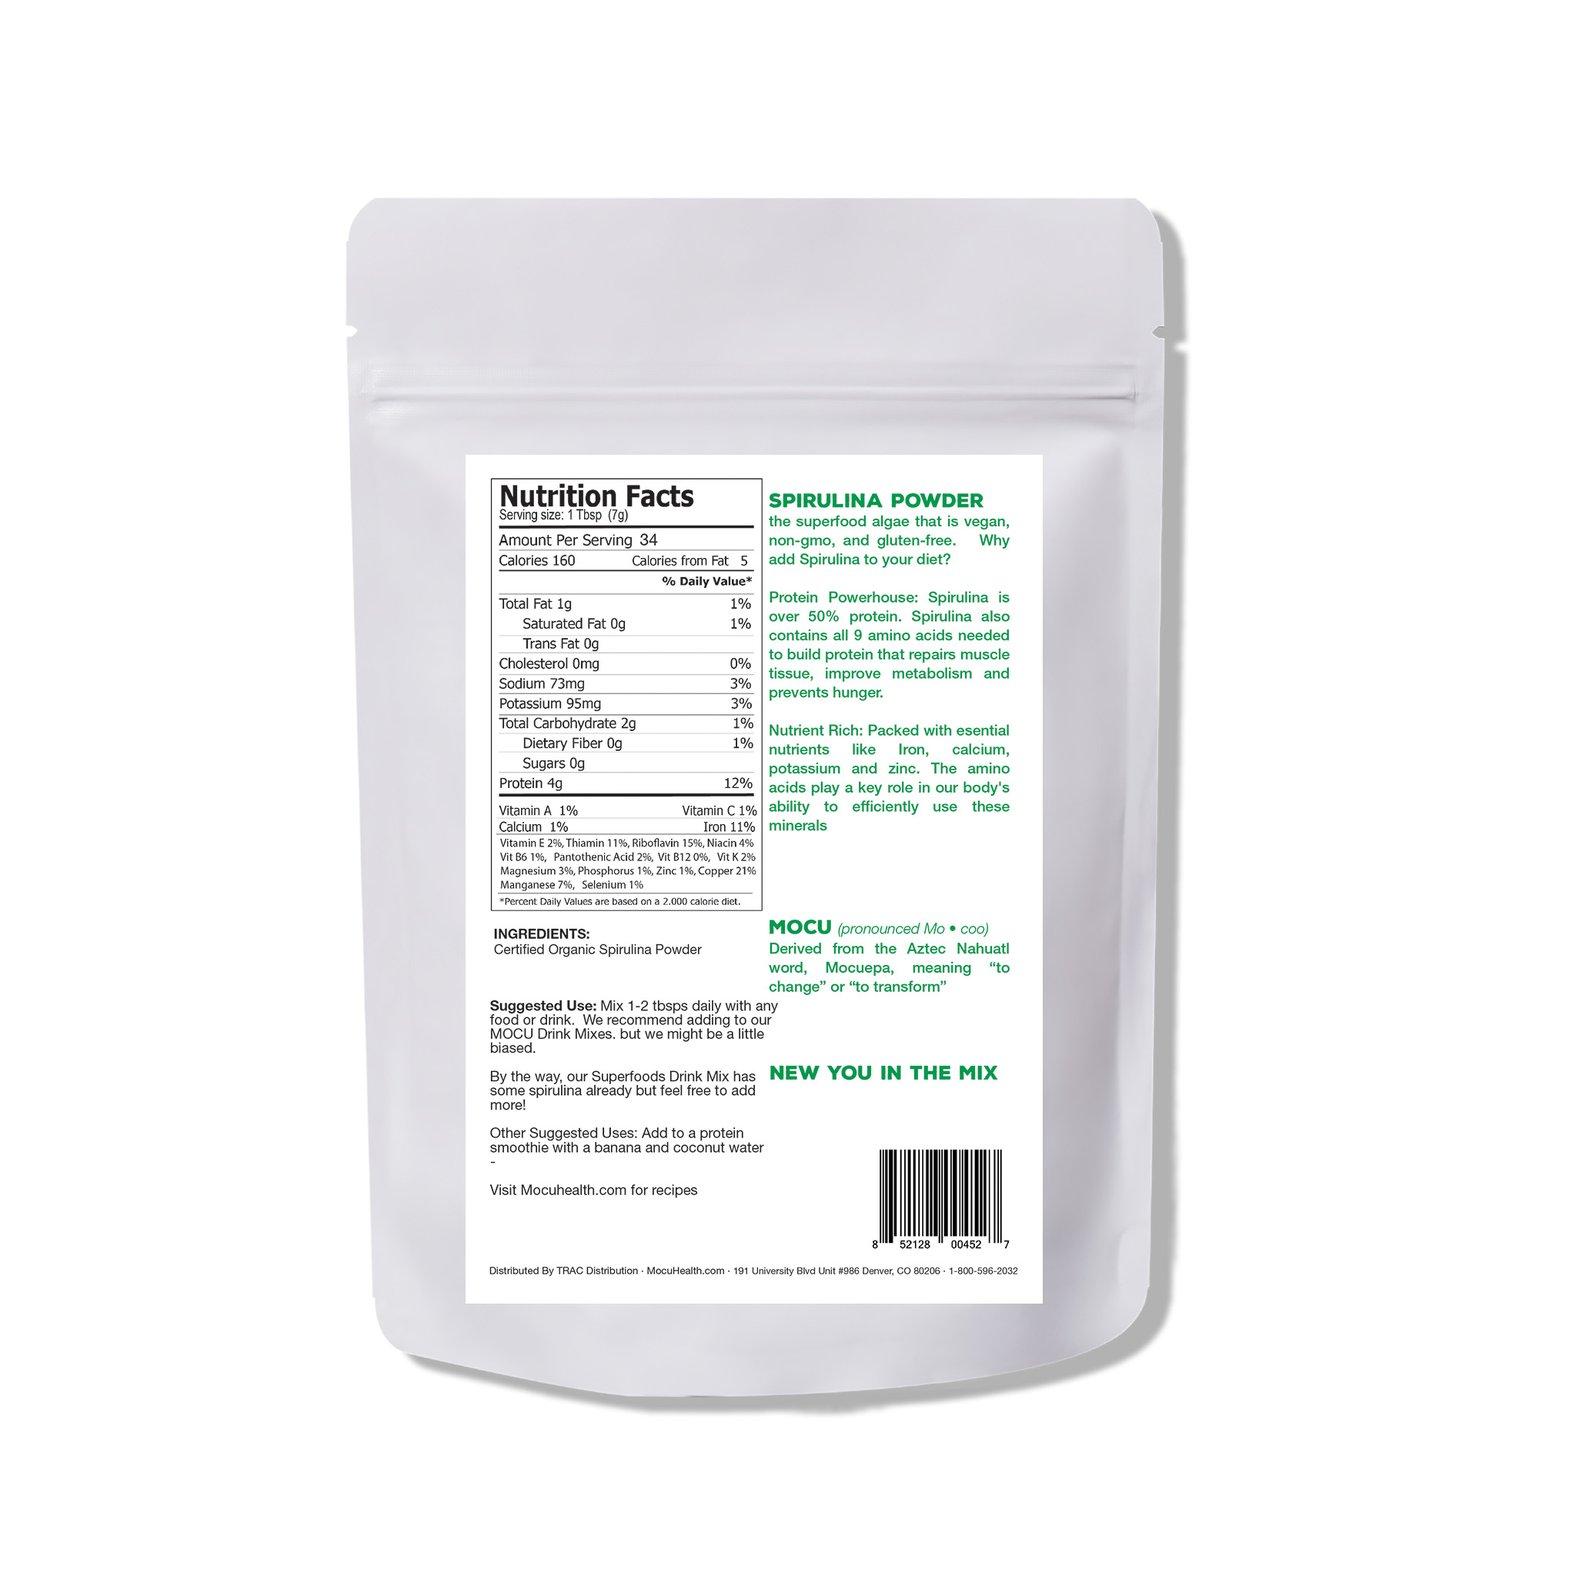 mocu-organic-spirulina-powder-back.jpg